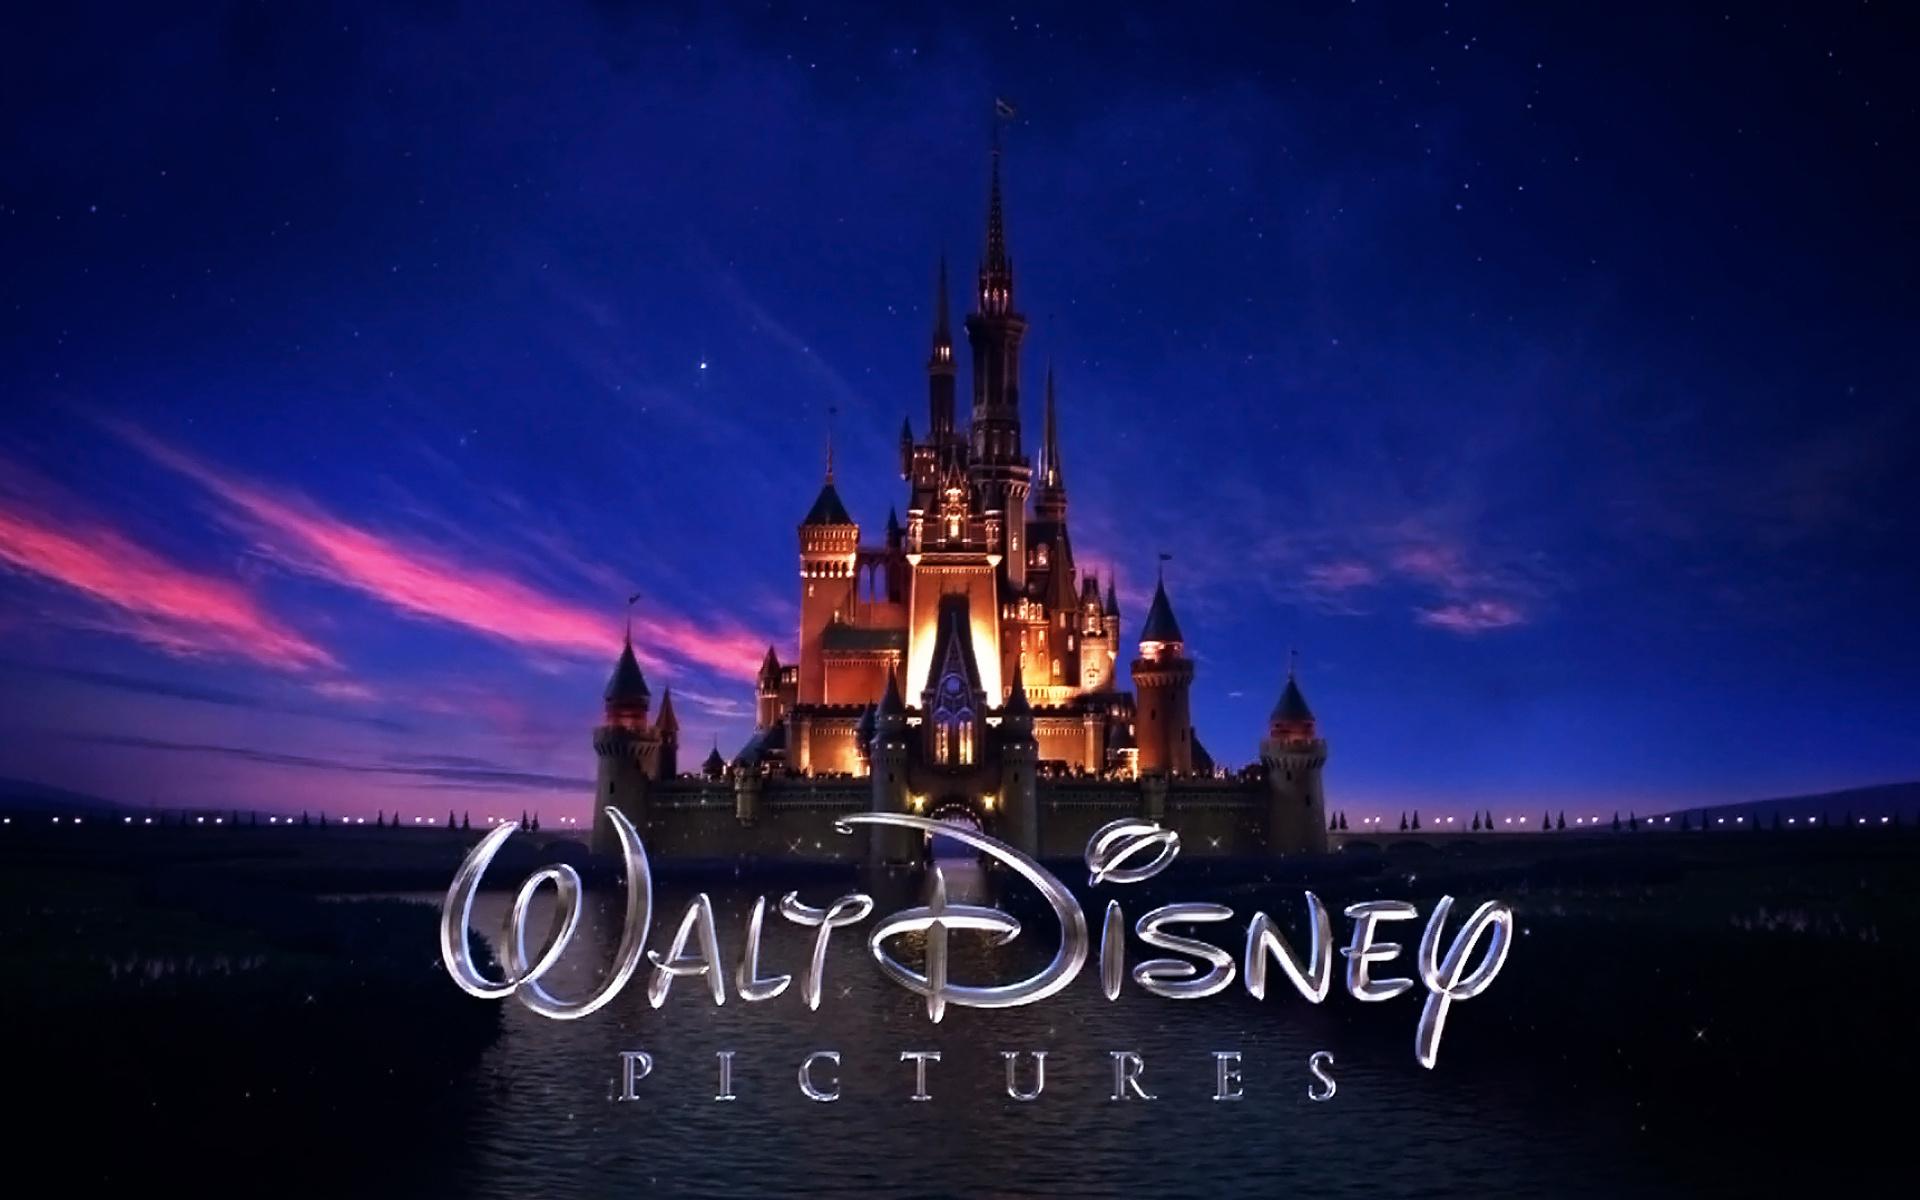 walt disney logo castle wallpapers pictures download 1920x1200